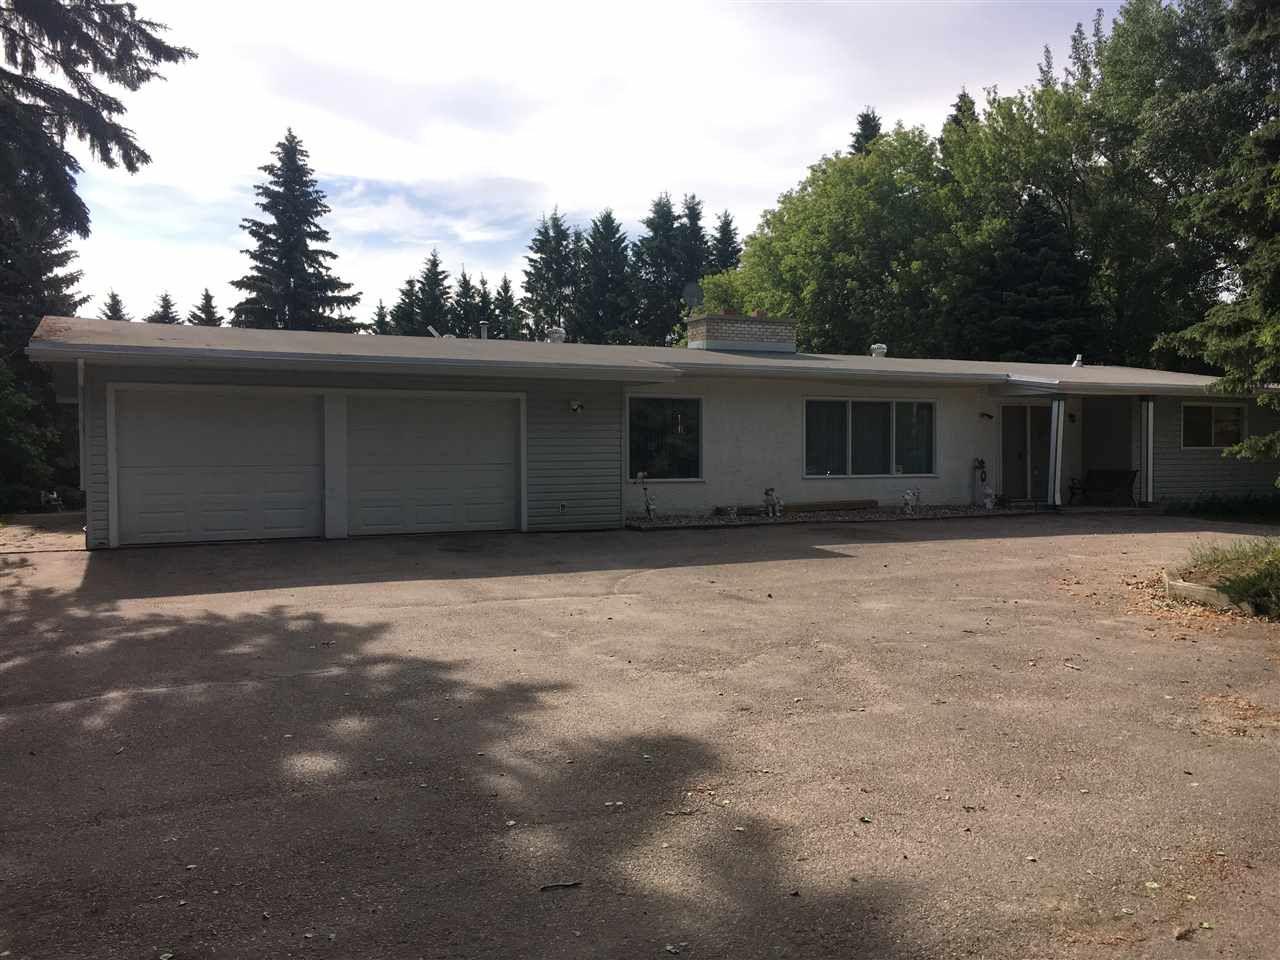 Main Photo: 4411 209 Street in Edmonton: Zone 57 House for sale : MLS®# E4101802